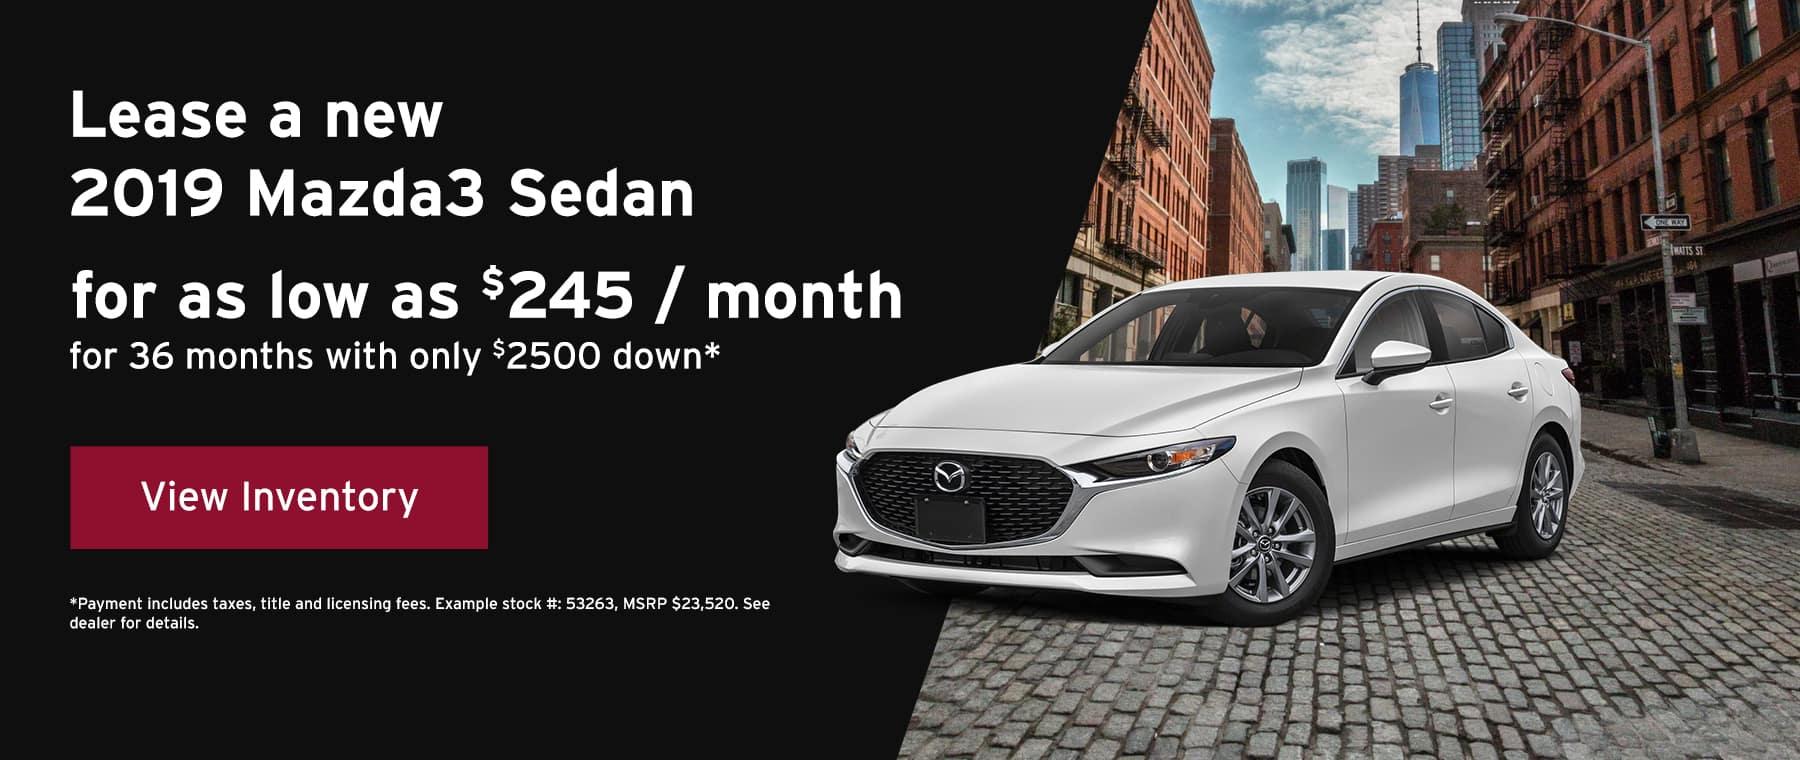 June 2019 Mazda 3 offer